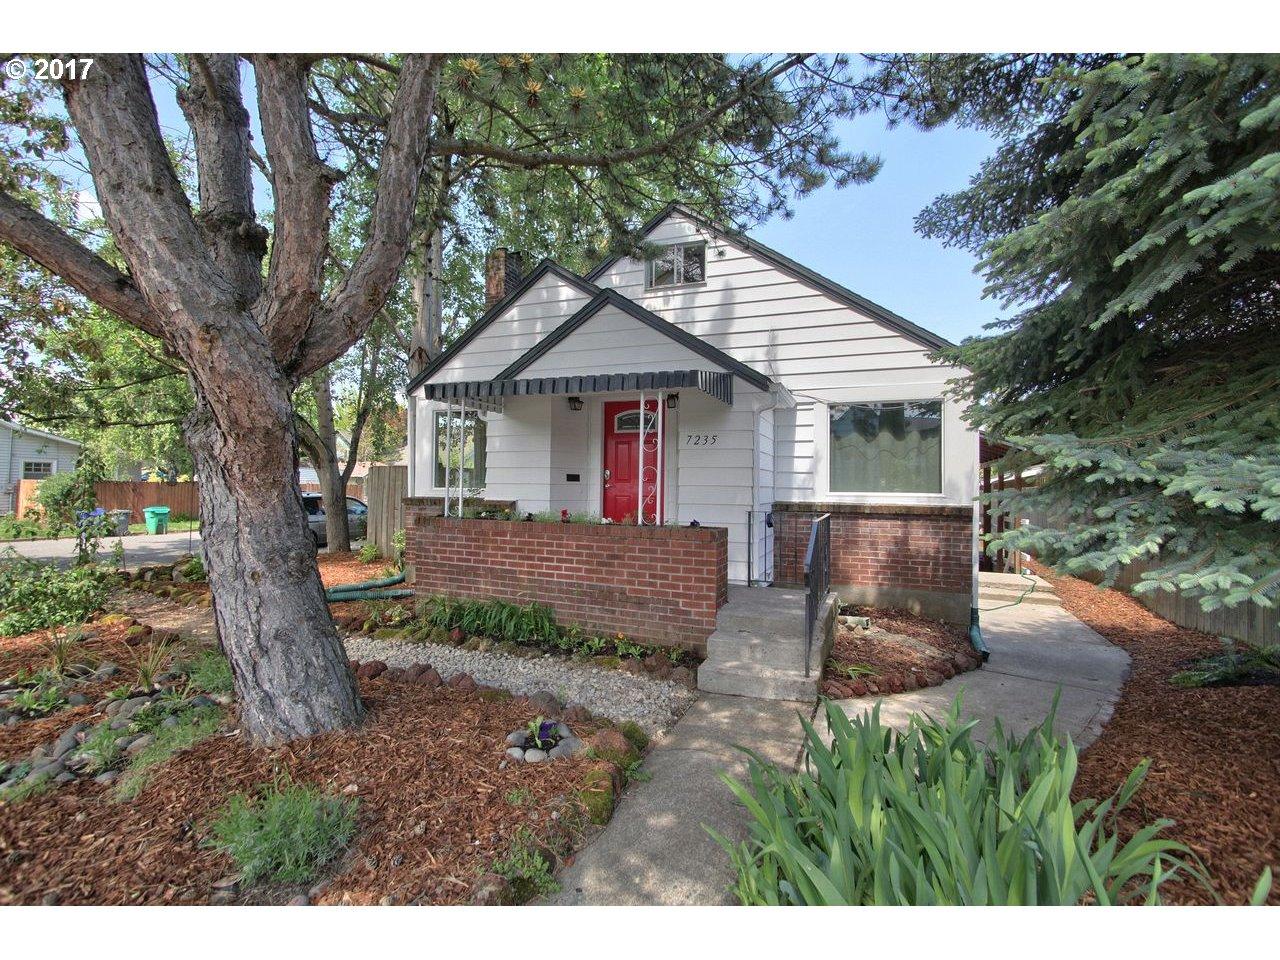 7235 N PRINCETON ST, Portland, OR 97203